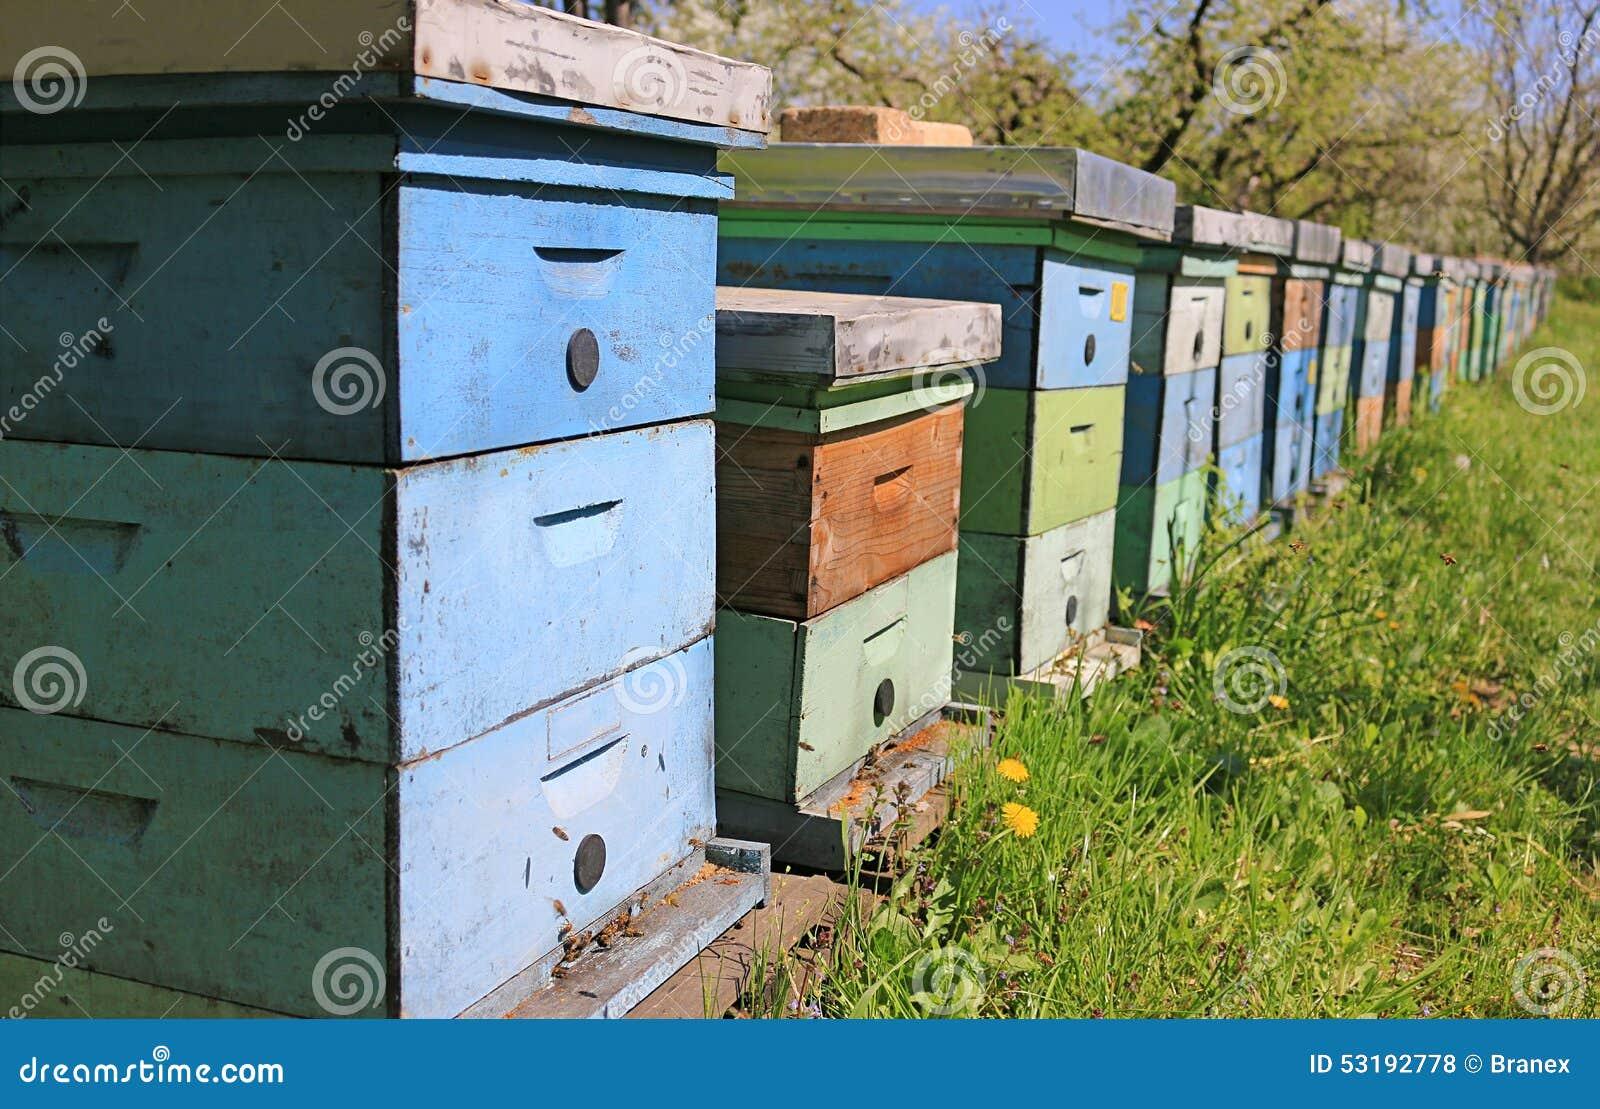 Beekeeping, bees and hives